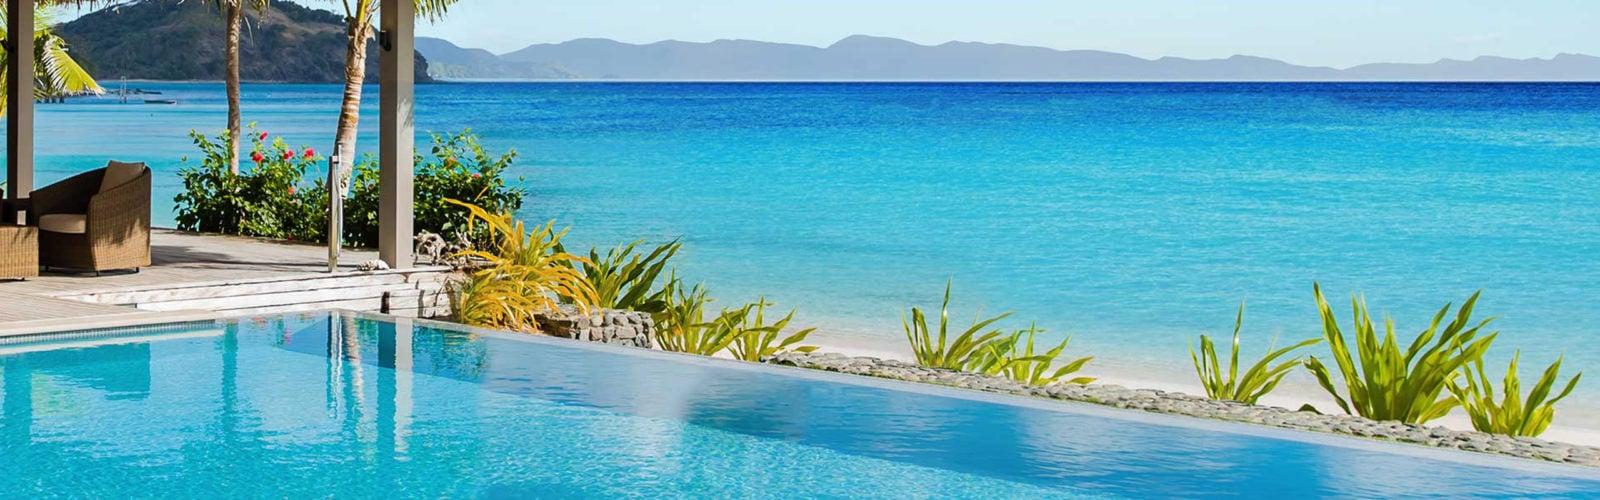 kokomo-private-island-villa-pool